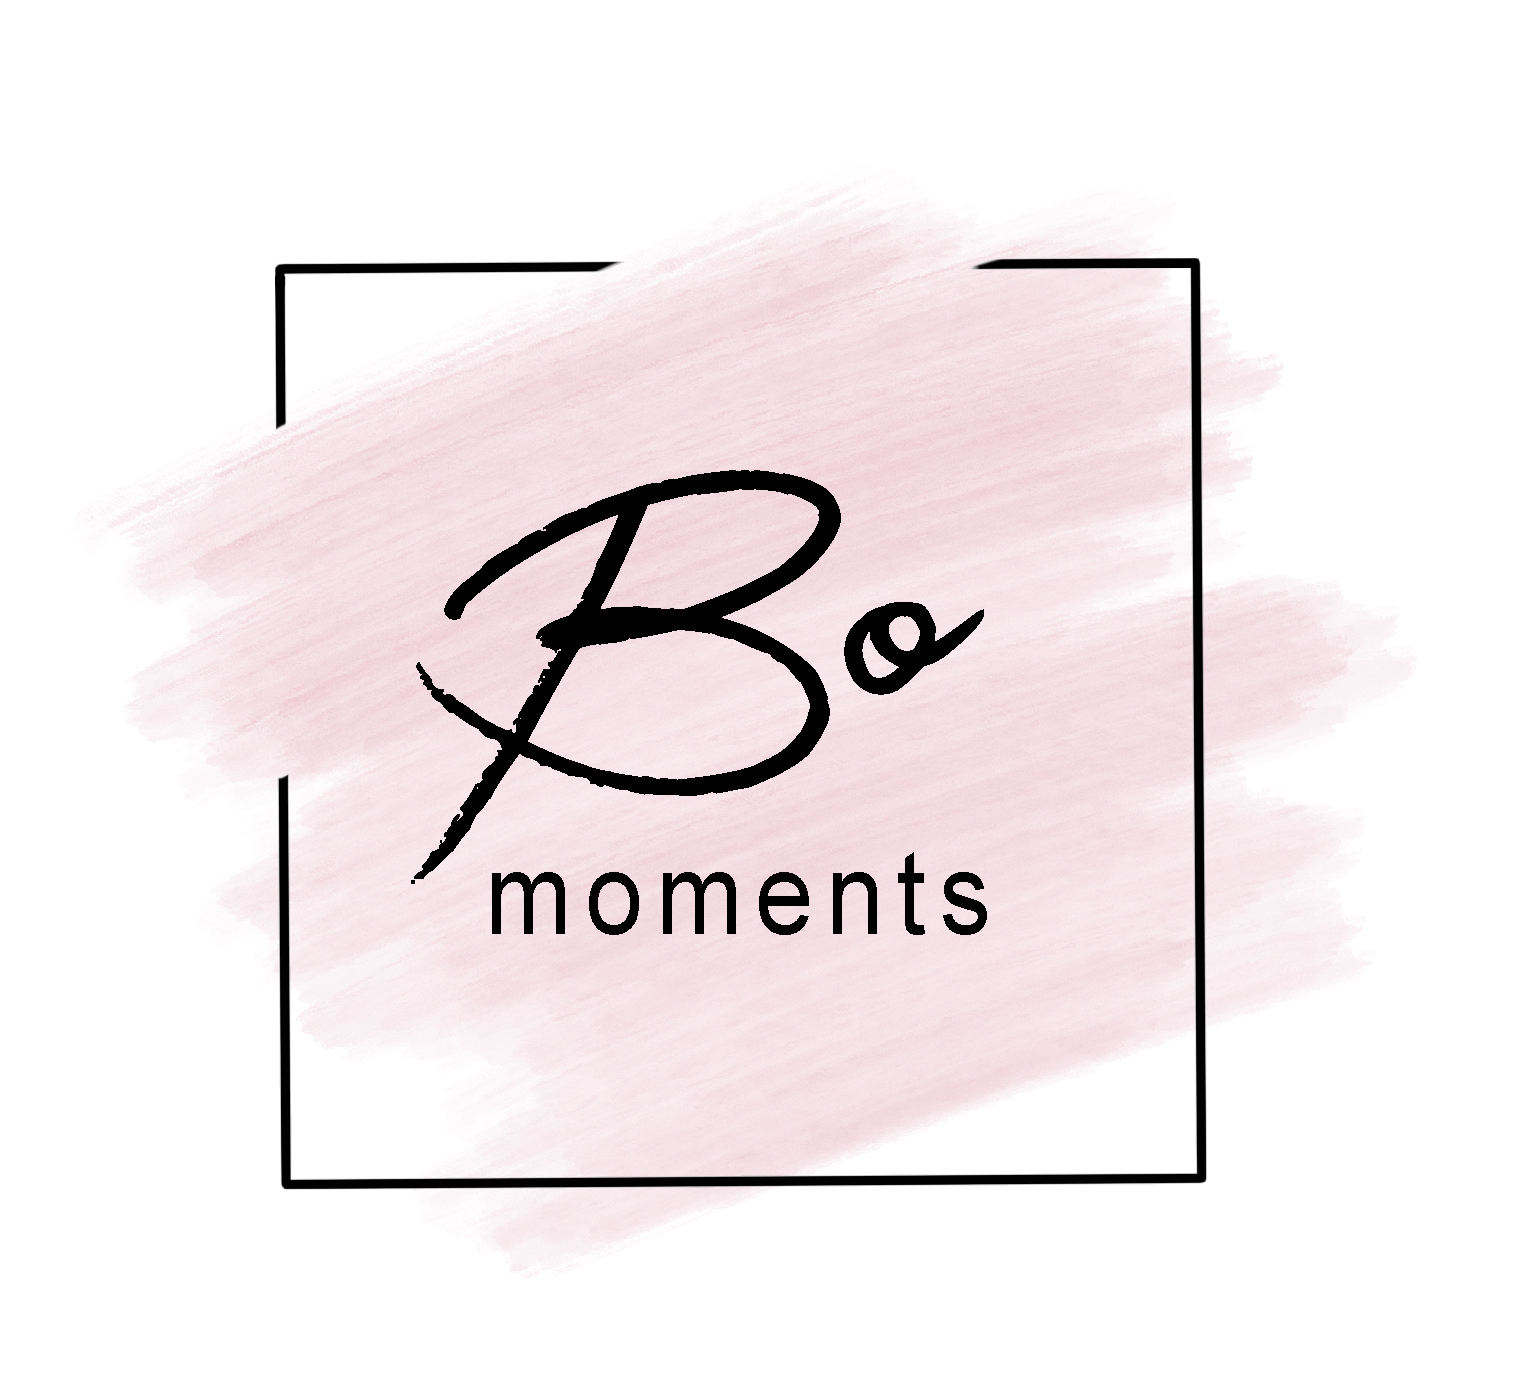 Bo Moments – Geboortekaartjes en gelegenheidsdrukwerk op maat